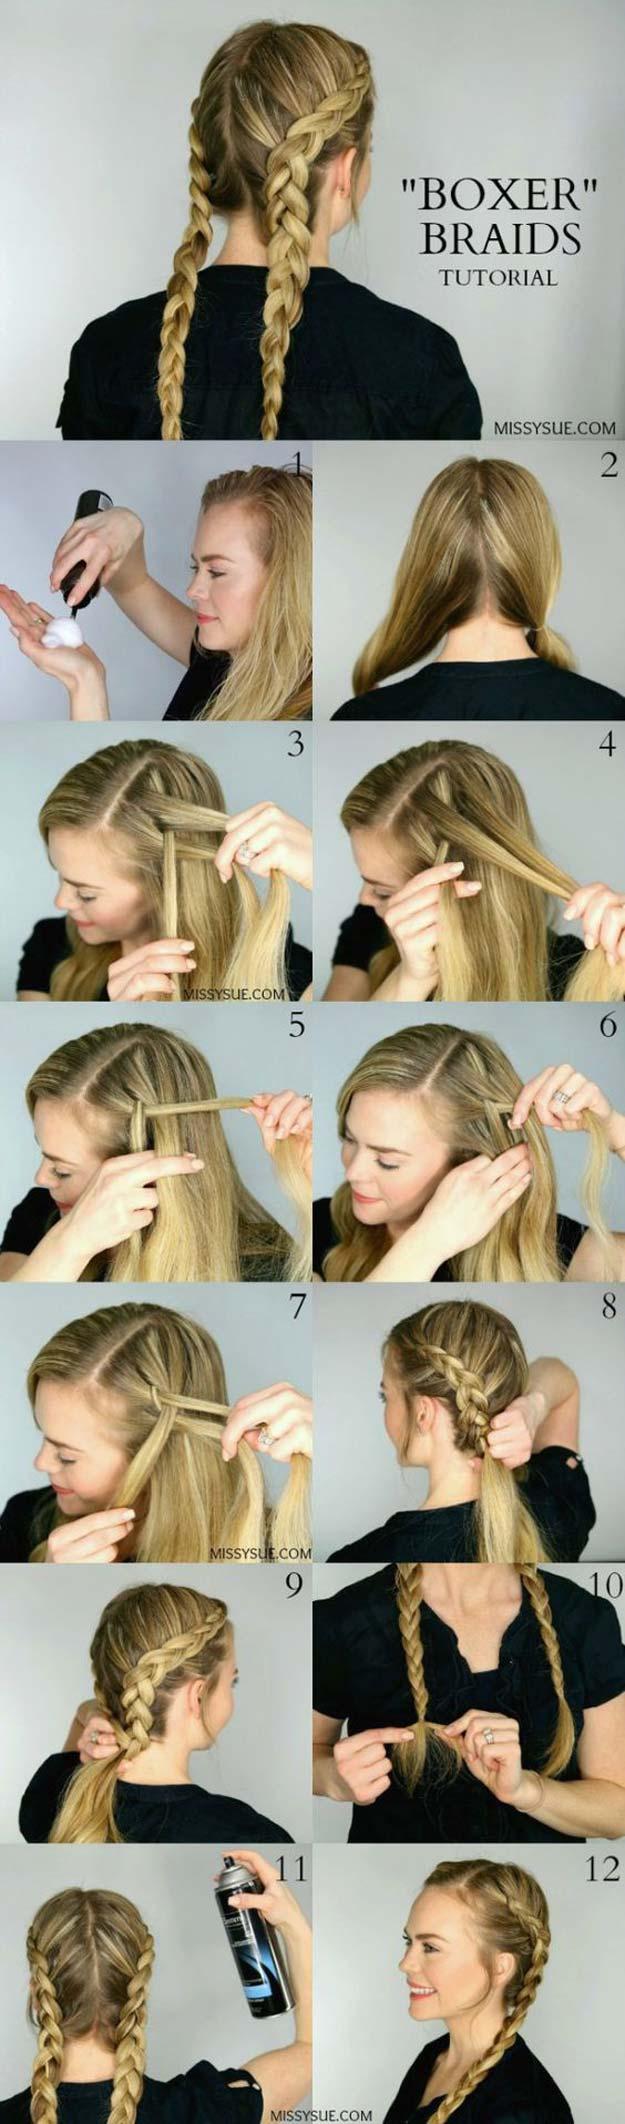 Best Hair Braiding Tutorials - Dutch Boxer Braids - Easy Step by Step Tutorials for Braids - How To Braid Fishtail, French Braids, Flower Crown, Side Braids, Cornrows, Updos - Cool Braided Hairstyles for Girls, Teens and Women - School, Day and Evening, Boho, Casual and Formal Looks #hairstyles #braiding #braidingtutorials #diyhair